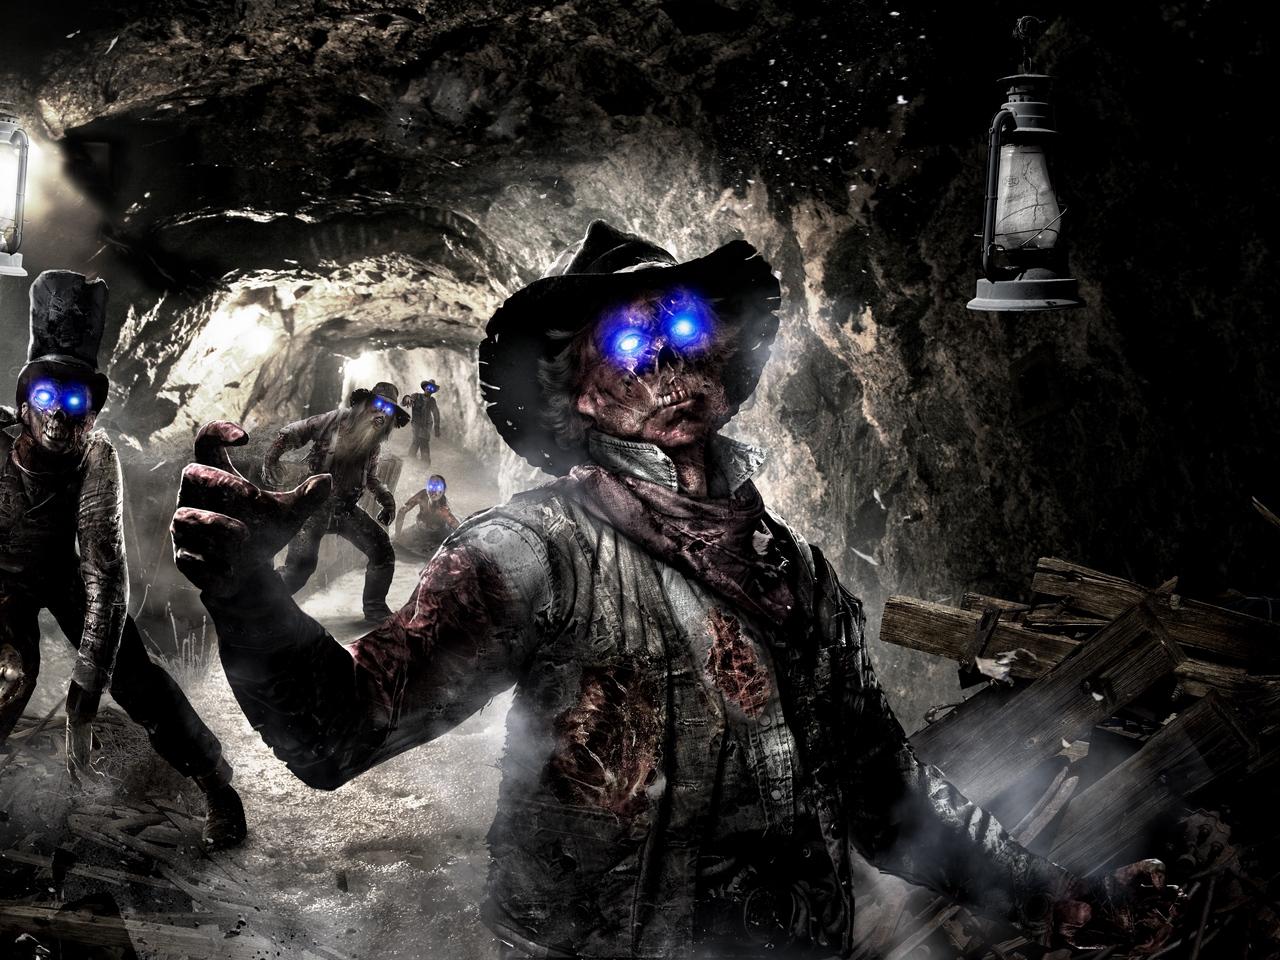 call of duty, black ops 2, art, zombie wallpaper,